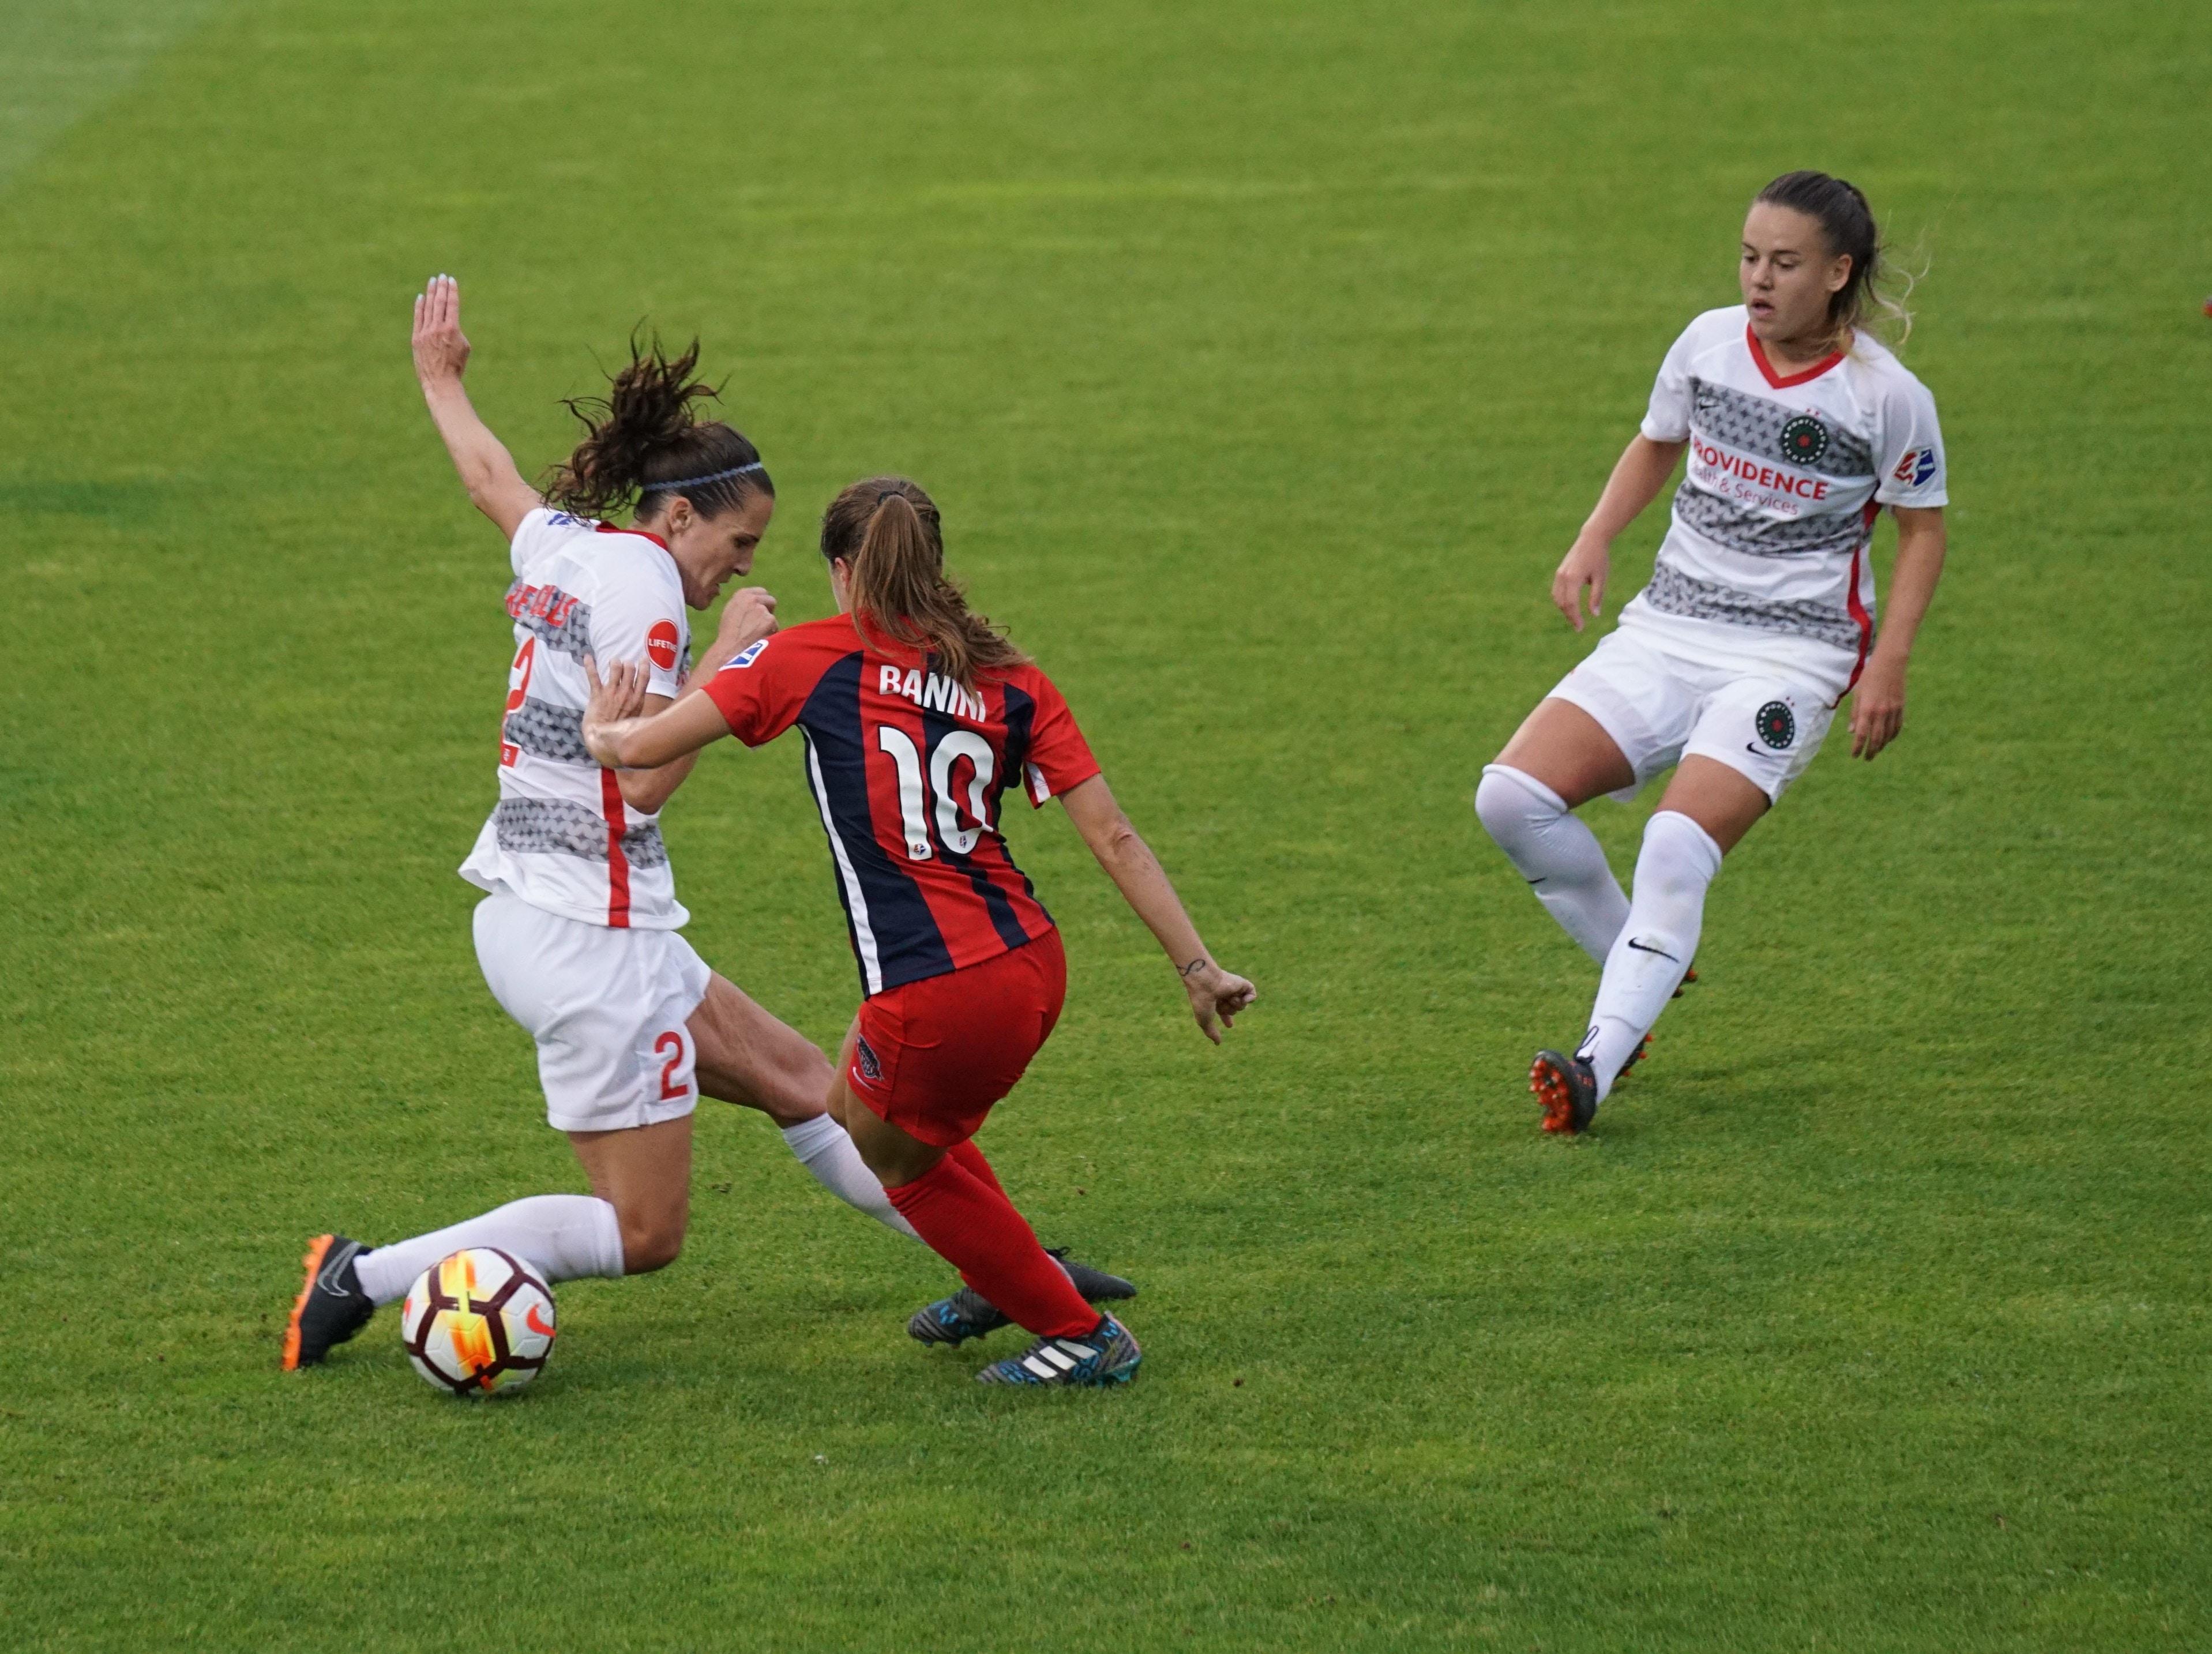 three women playing soccer